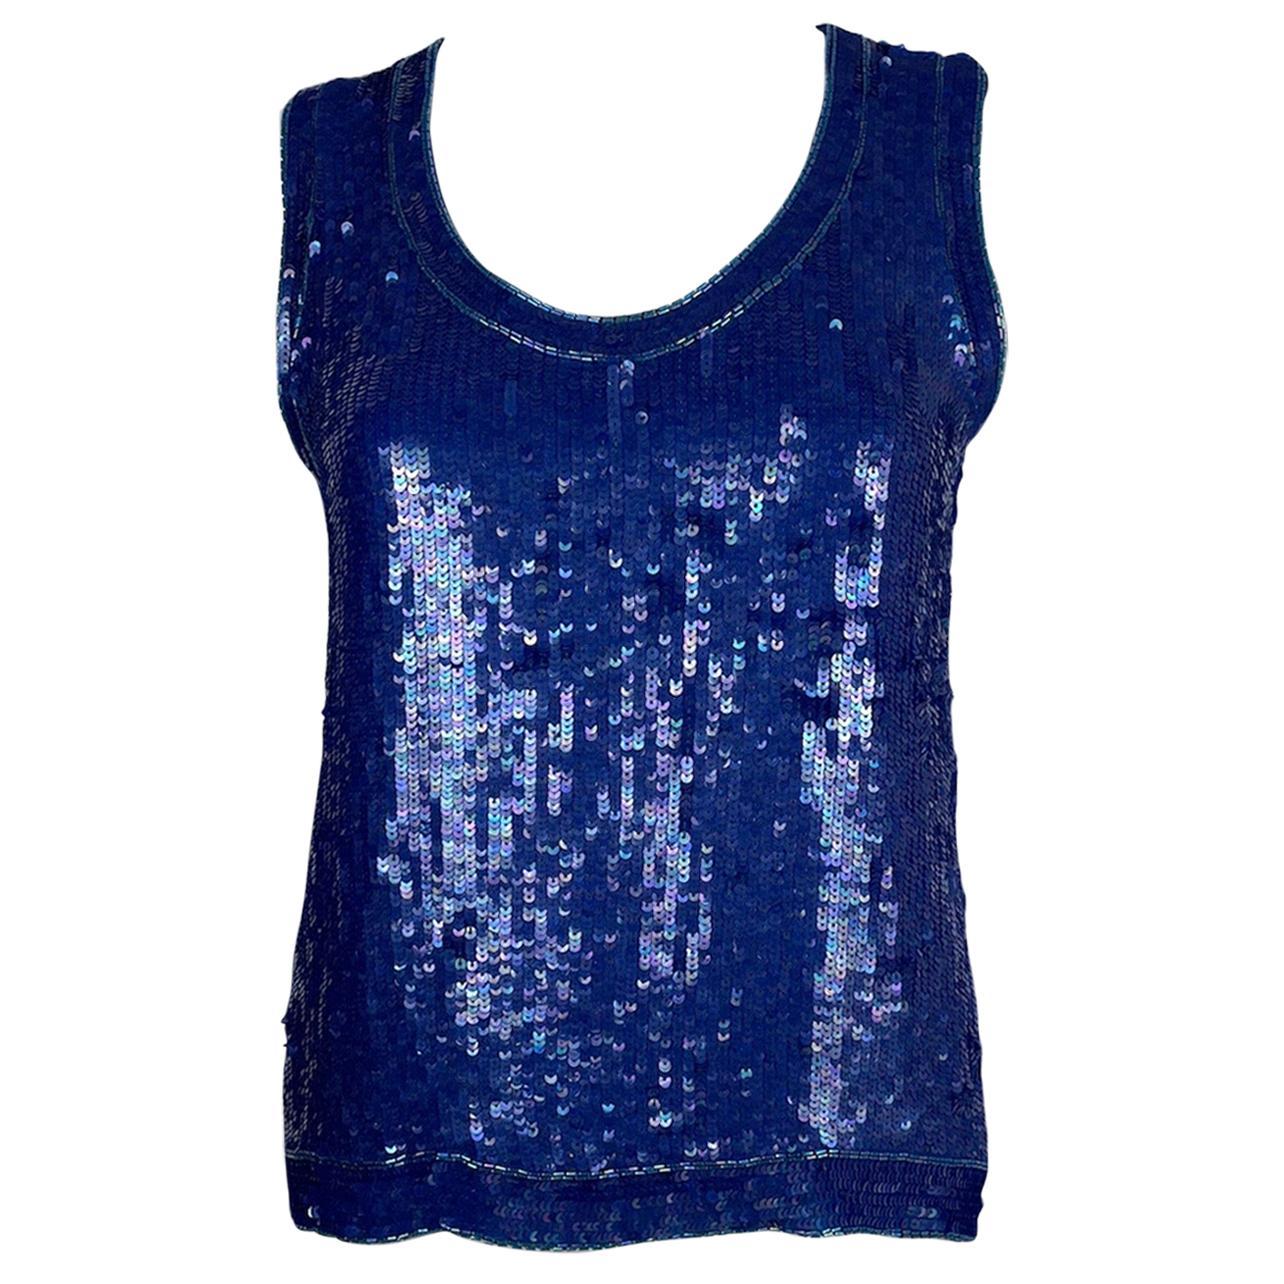 Saint Laurent Blue Sequins Silk Tank Top Sparkling Small size